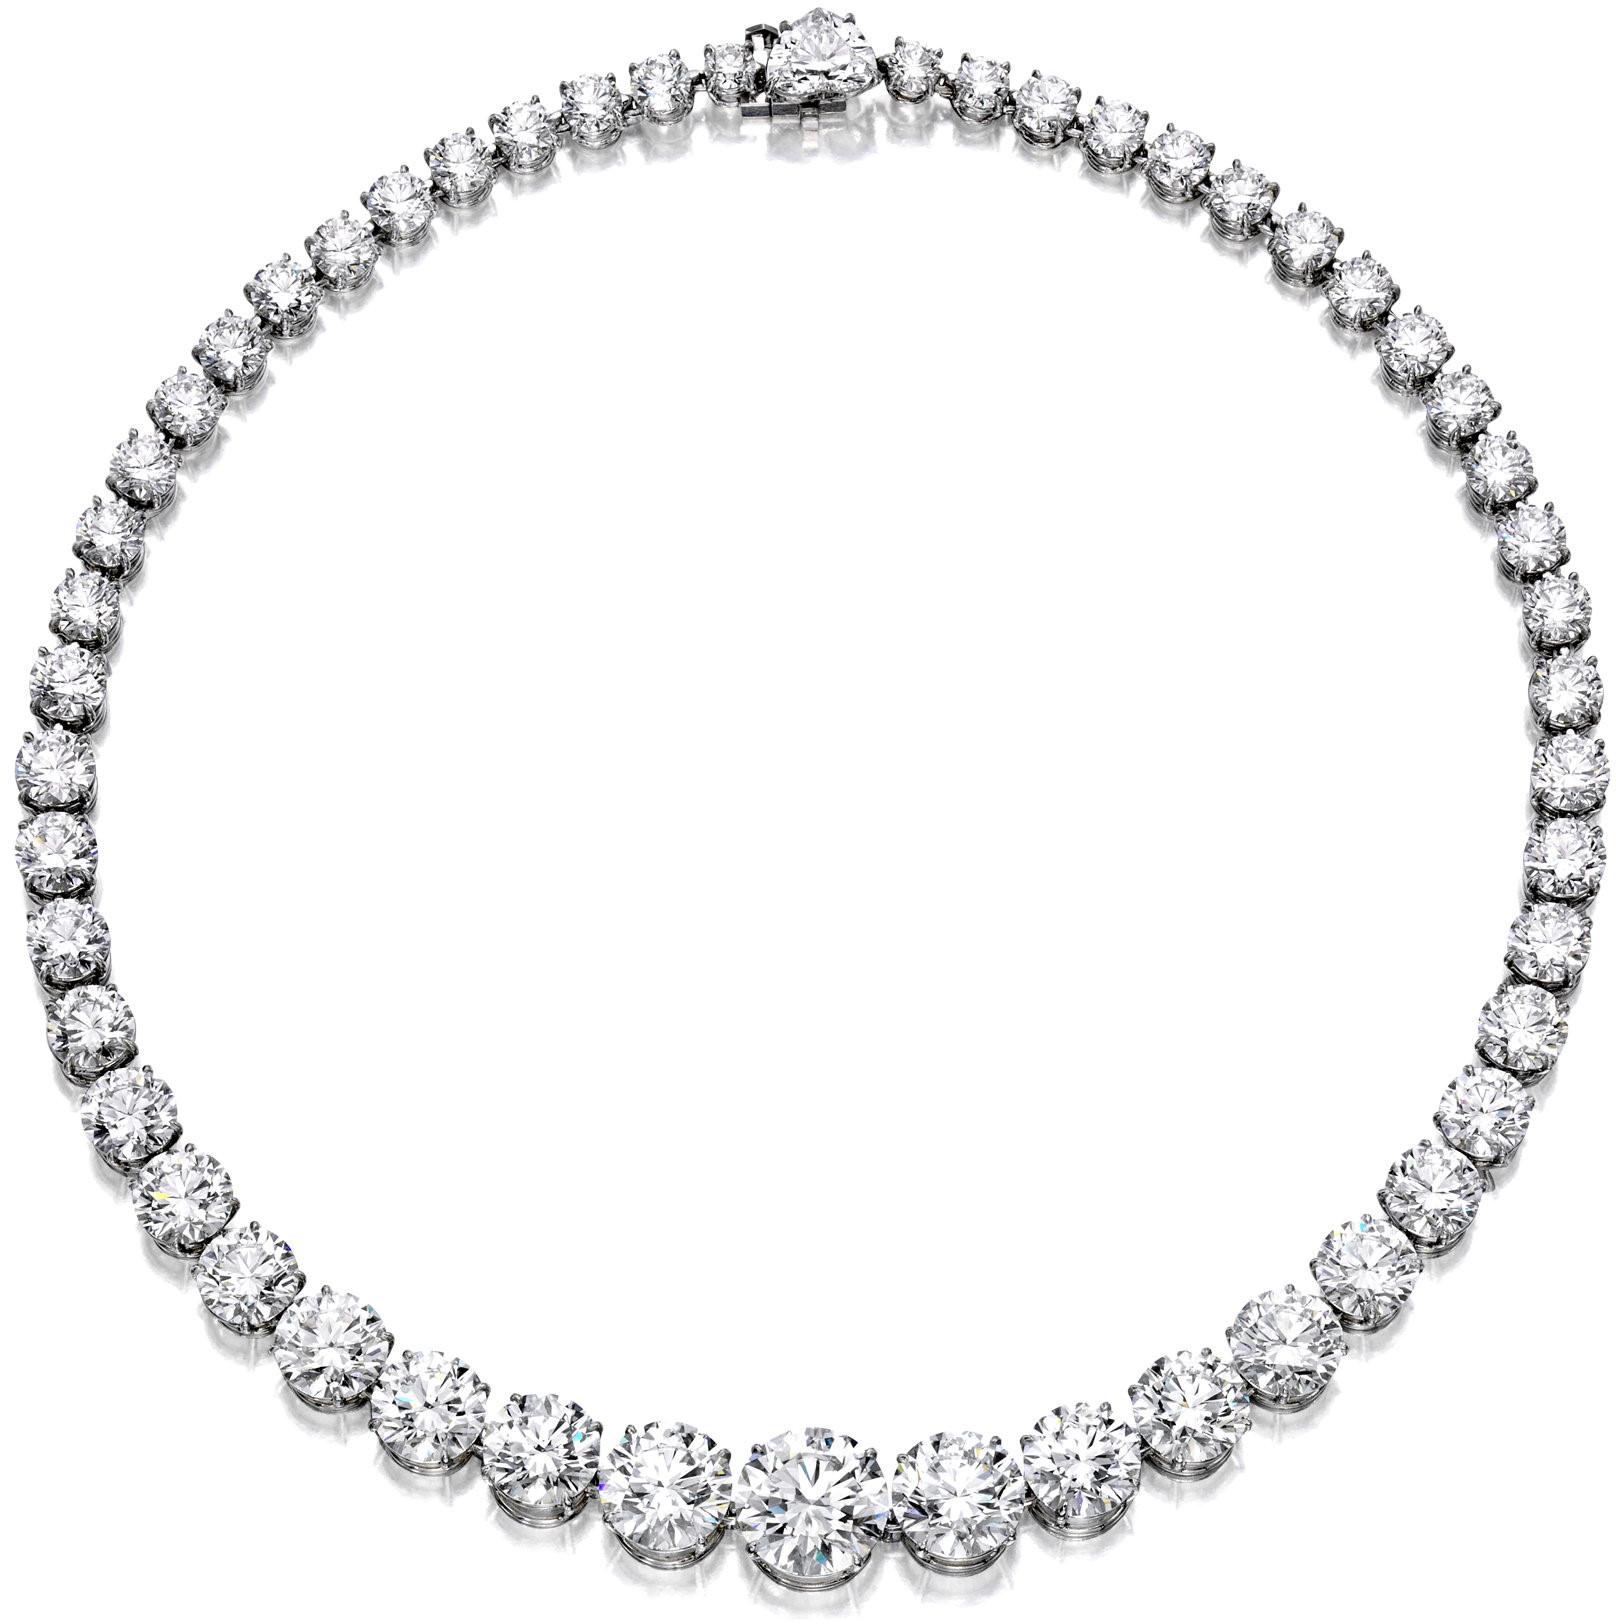 Bonhams'  $1.2 mil. 79.2 ct. triple-x cut diamond necklace